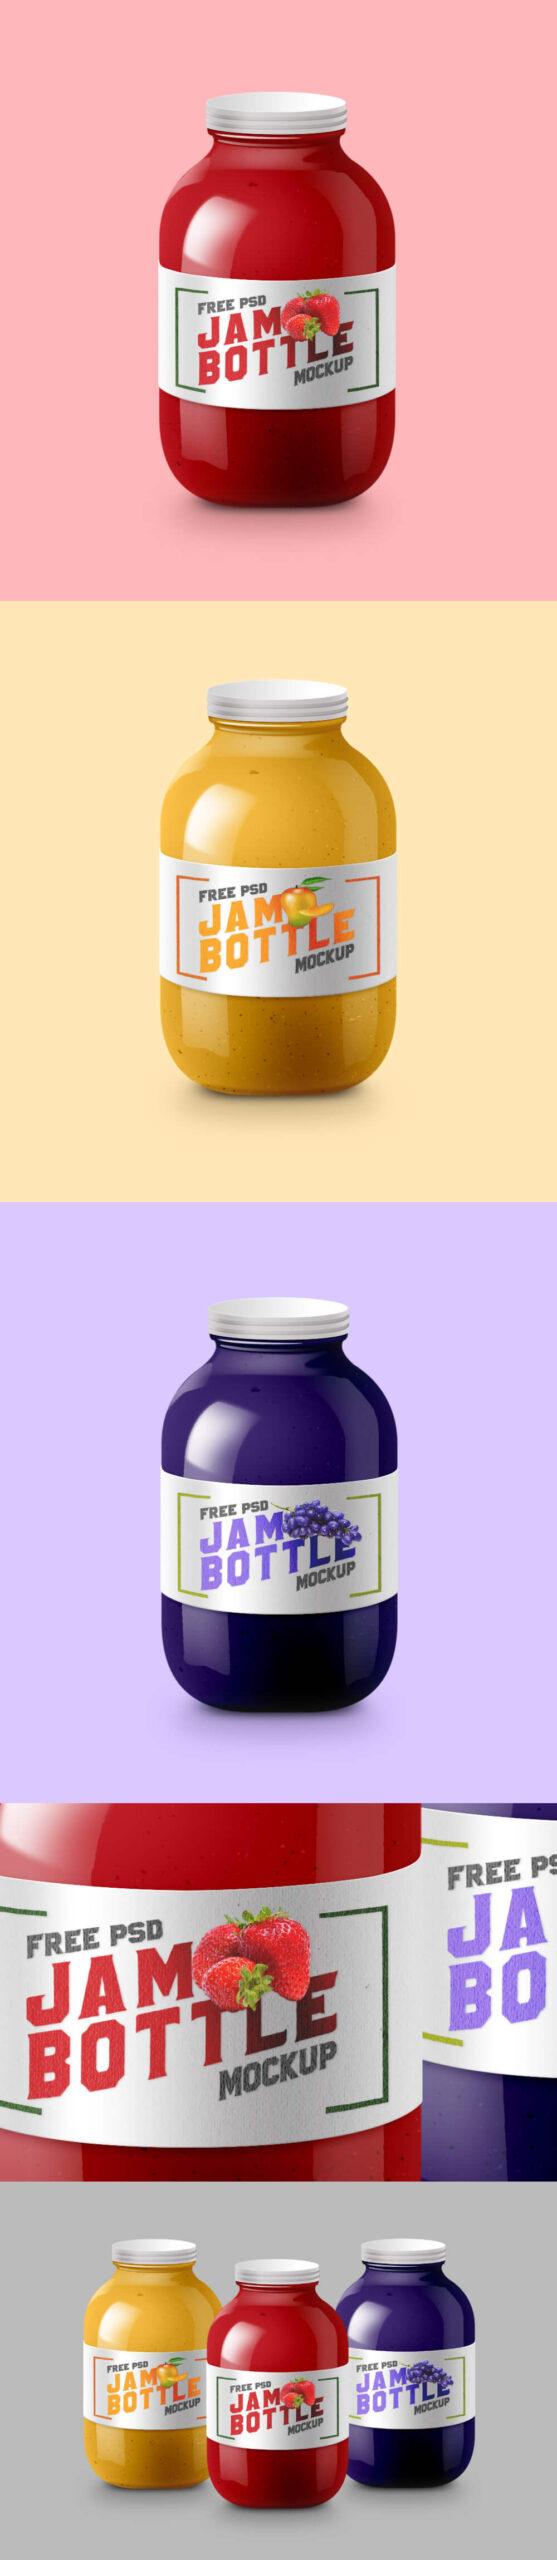 Free Tasty Jam Bottle Mockup PSD Template (1)